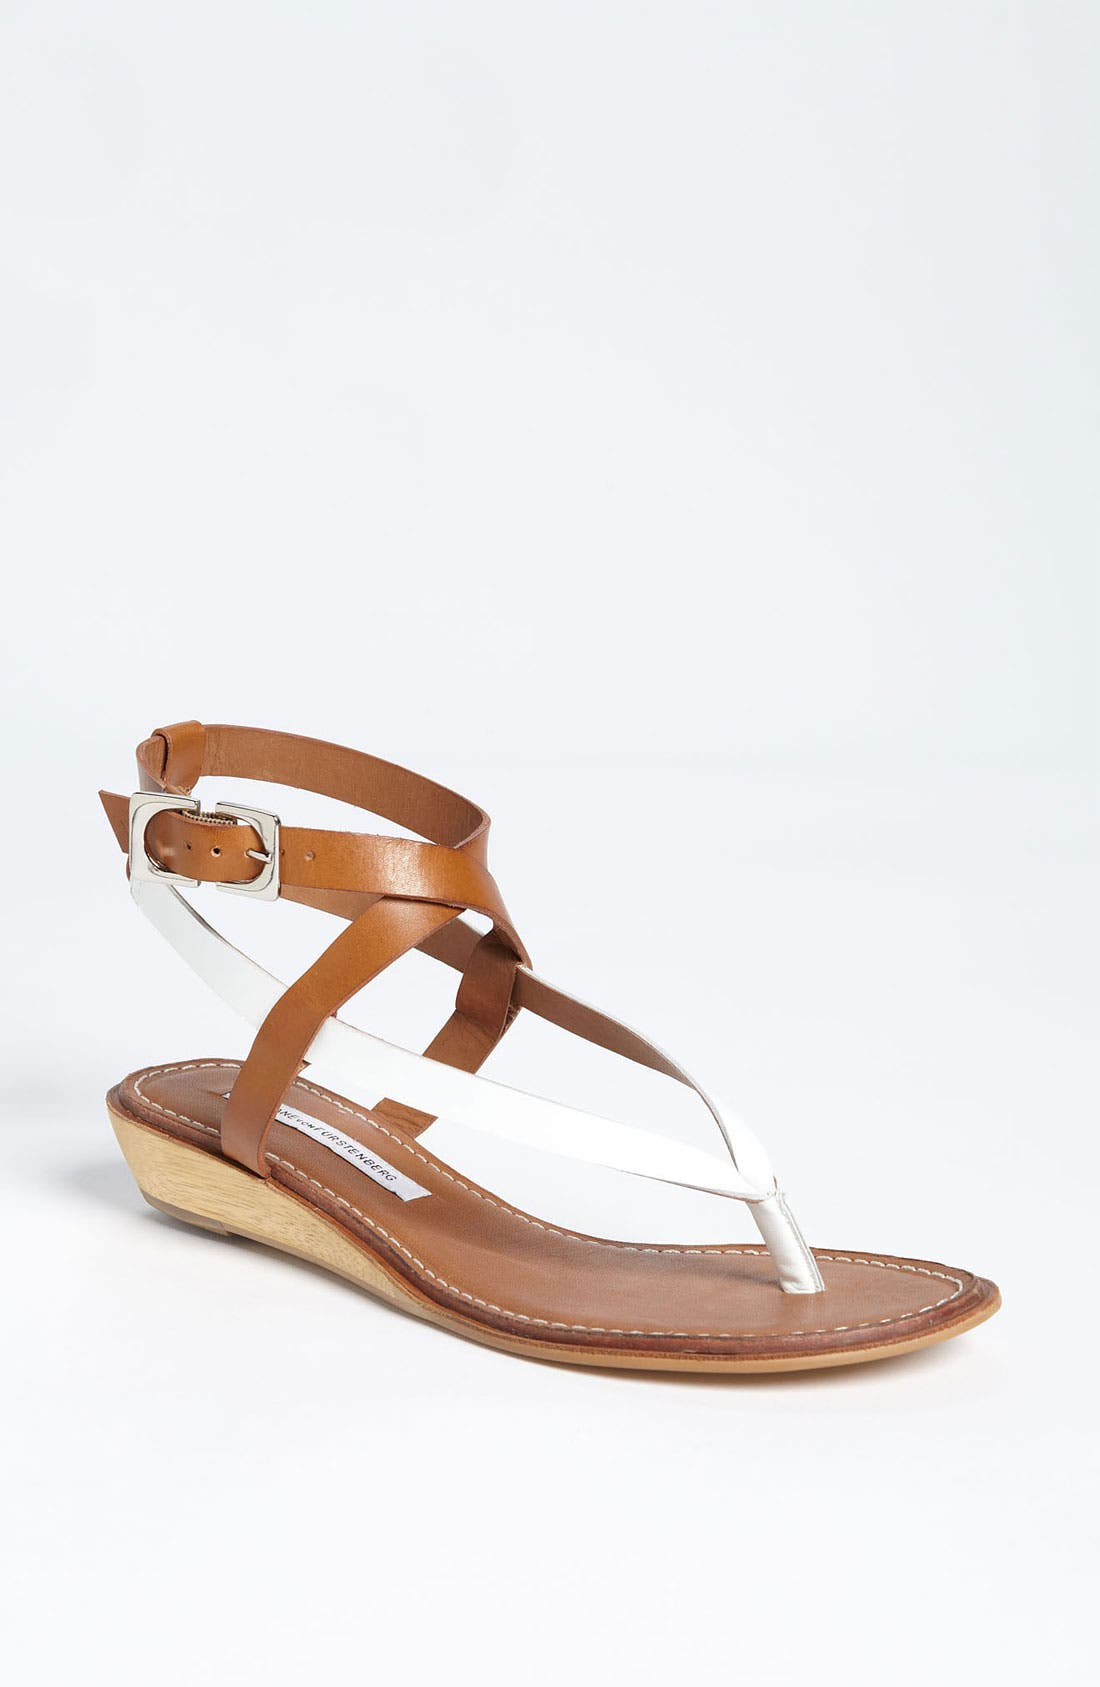 Alternate Image 1 Selected - Diane von Furstenberg 'Dottie' Sandal (Online Only)